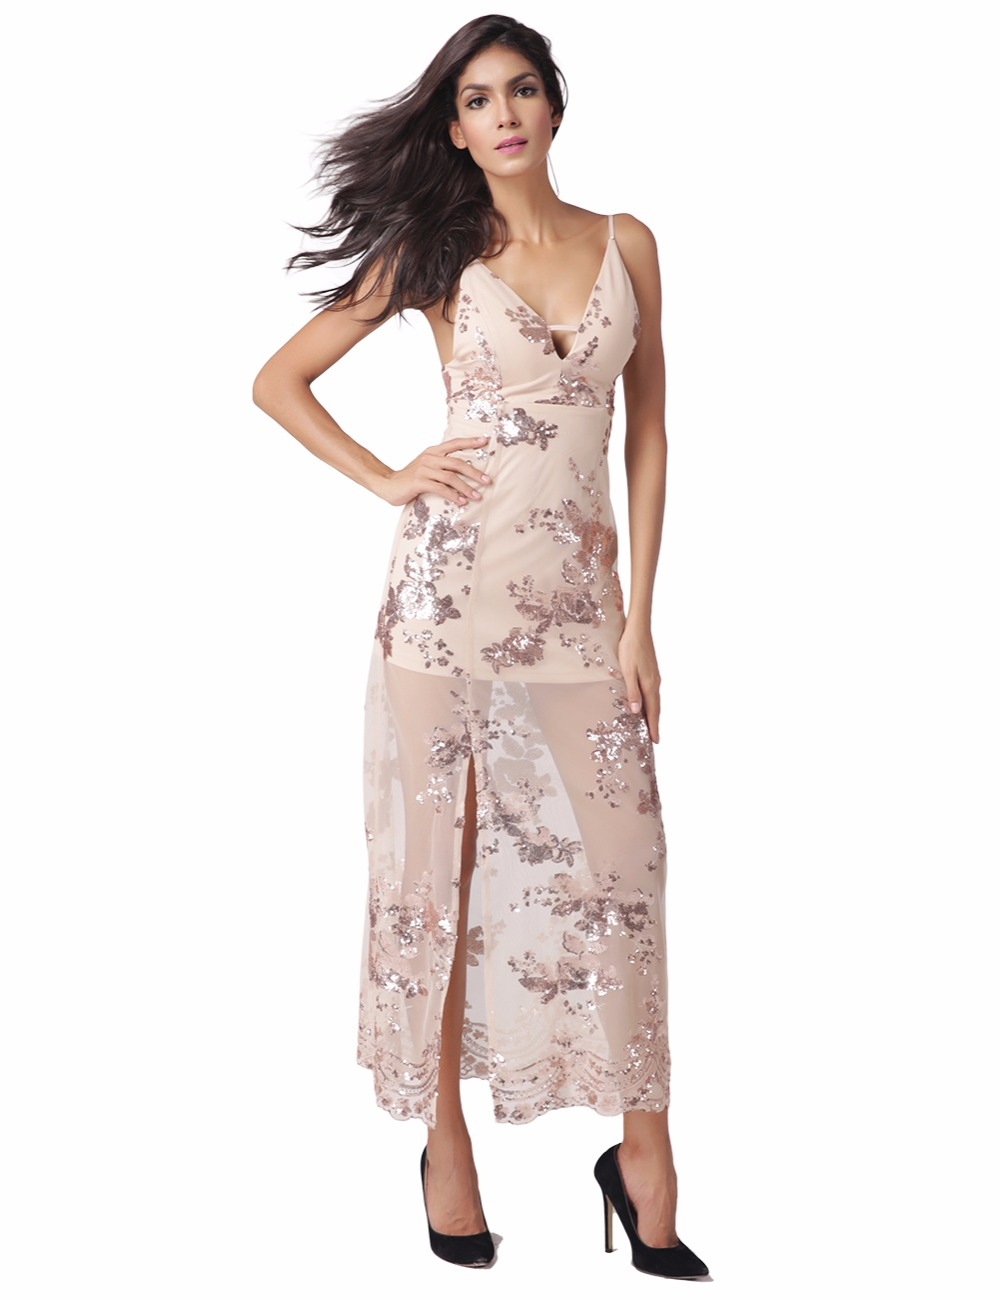 Buy Cheap Womens 2017 Summer Maxi Dress Sleeveless Deep V Neck Off Shoulder Sequined Slim Fashion Halter Dress Apricot